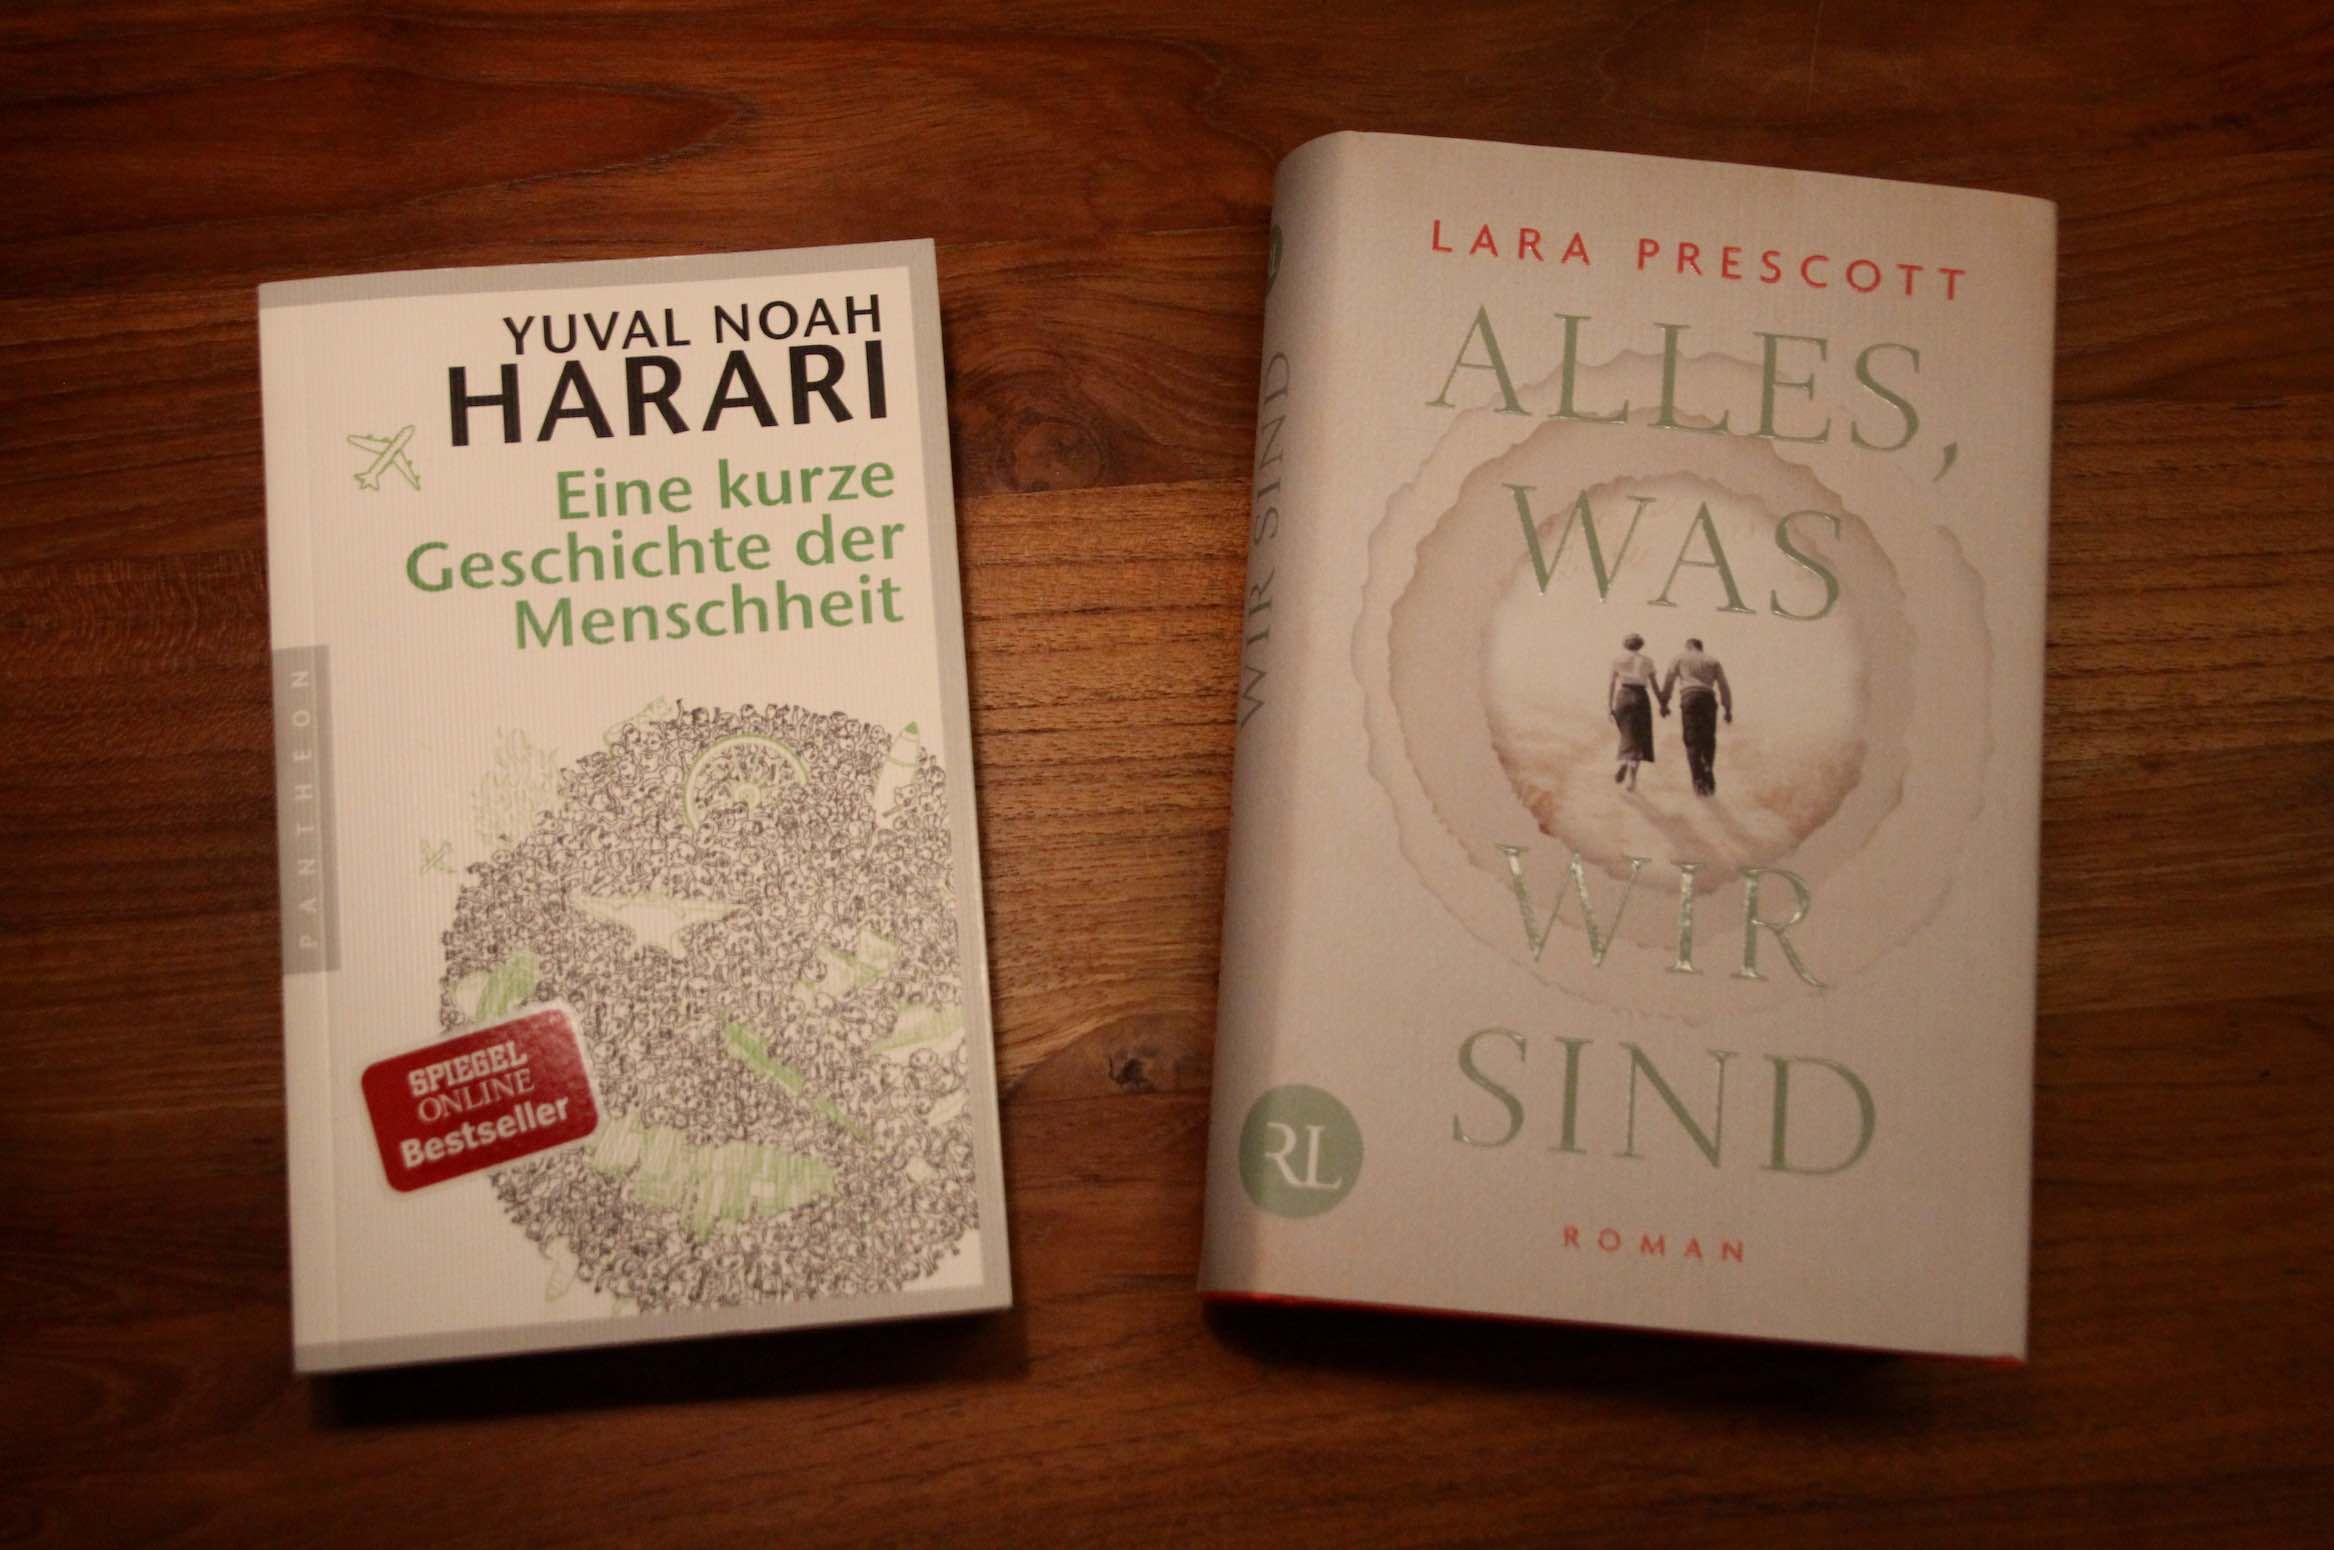 Lesen Harari Lara Prescott